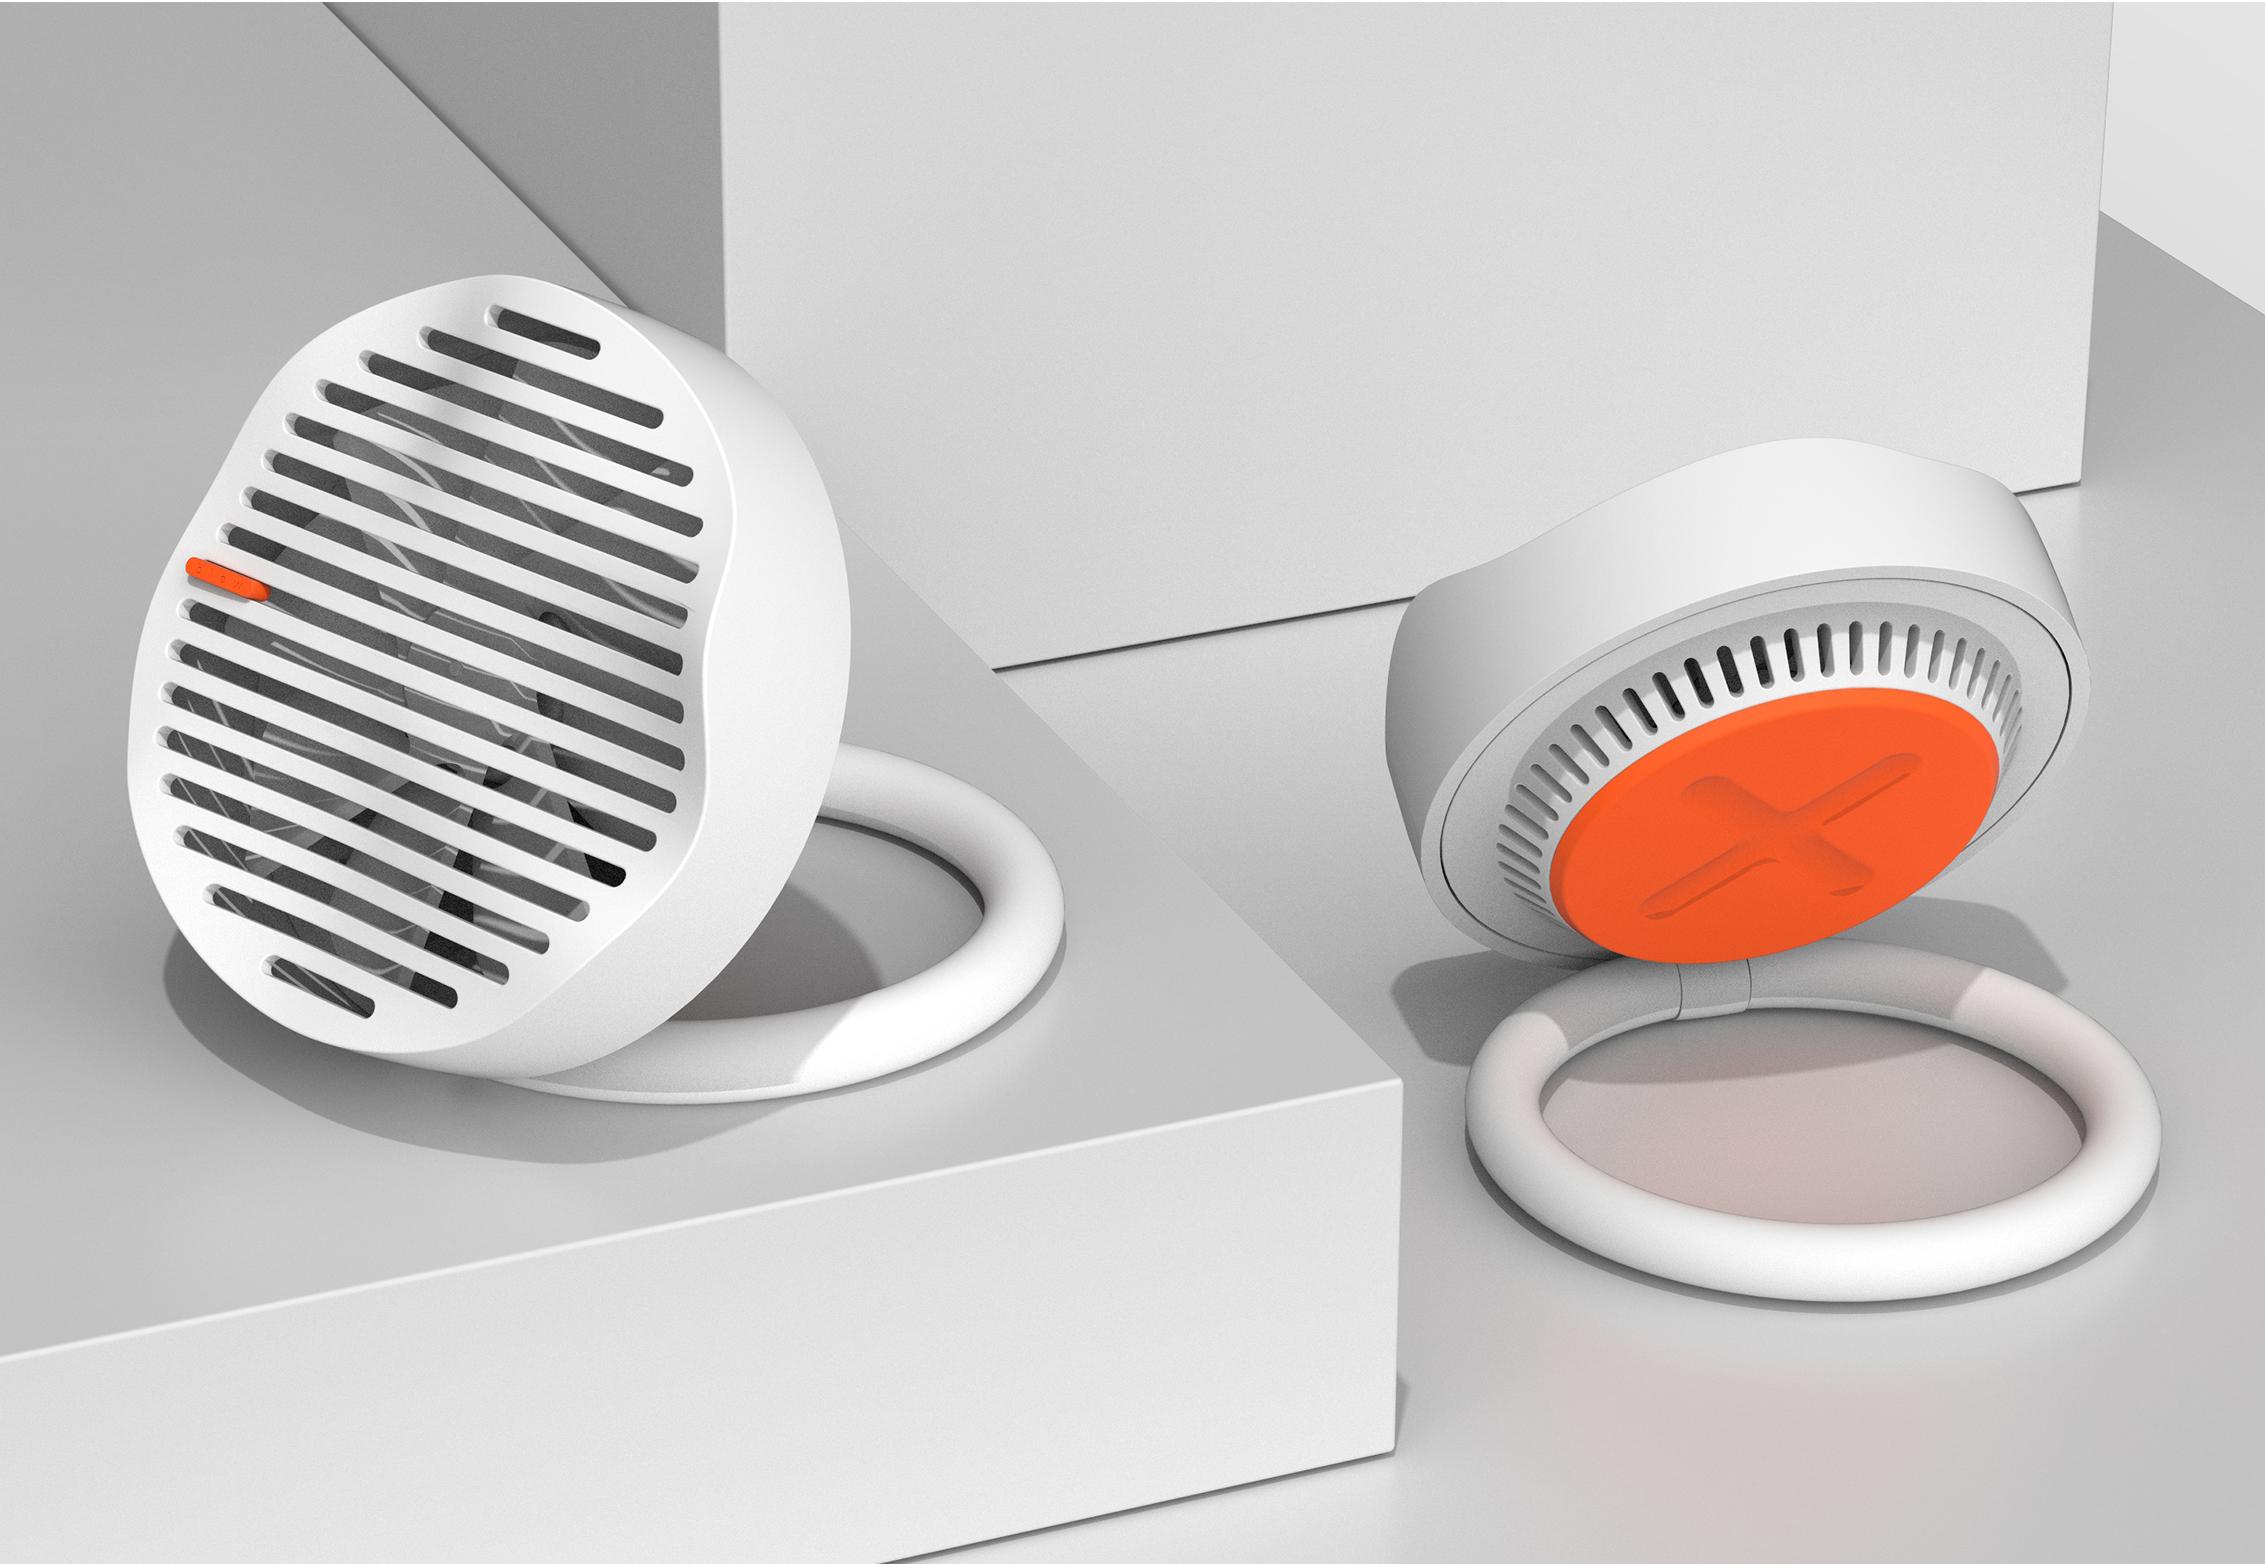 _blowing-with-cs-deskfan-hoang-industrialdesign_5.jpg